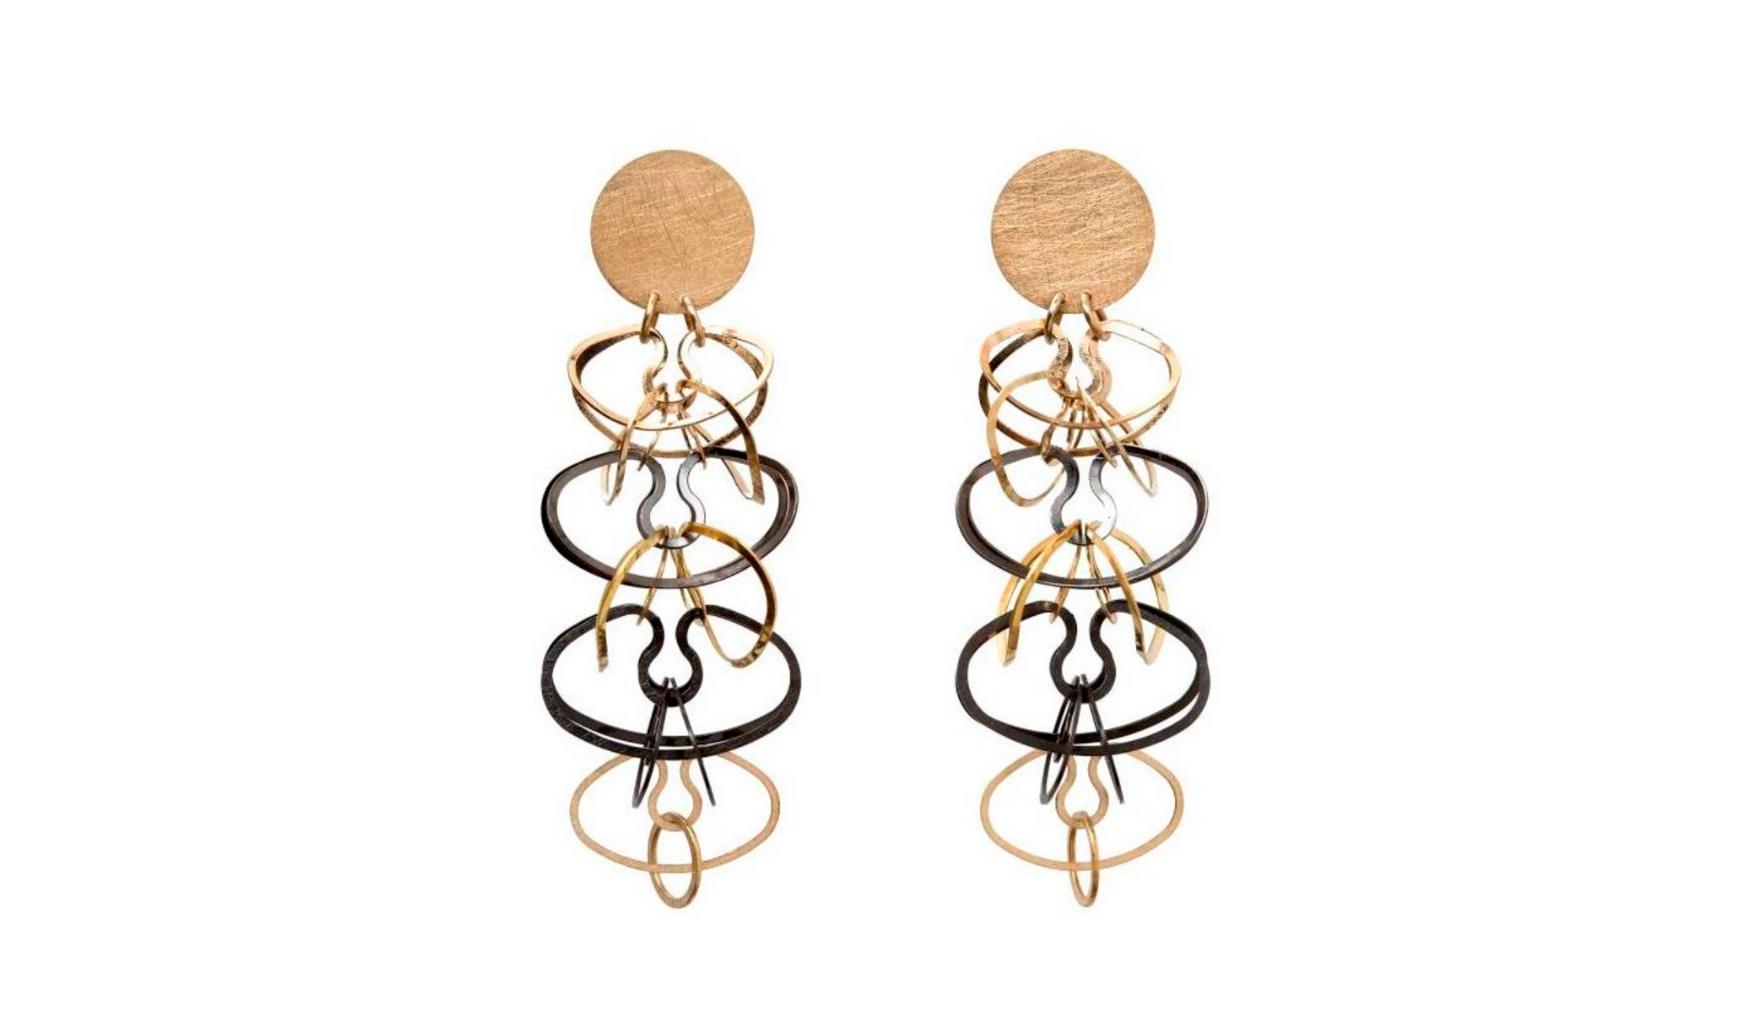 Carla Riccoboni, Alphabet earrings, Thereza Pedrosa gallery, Asolo